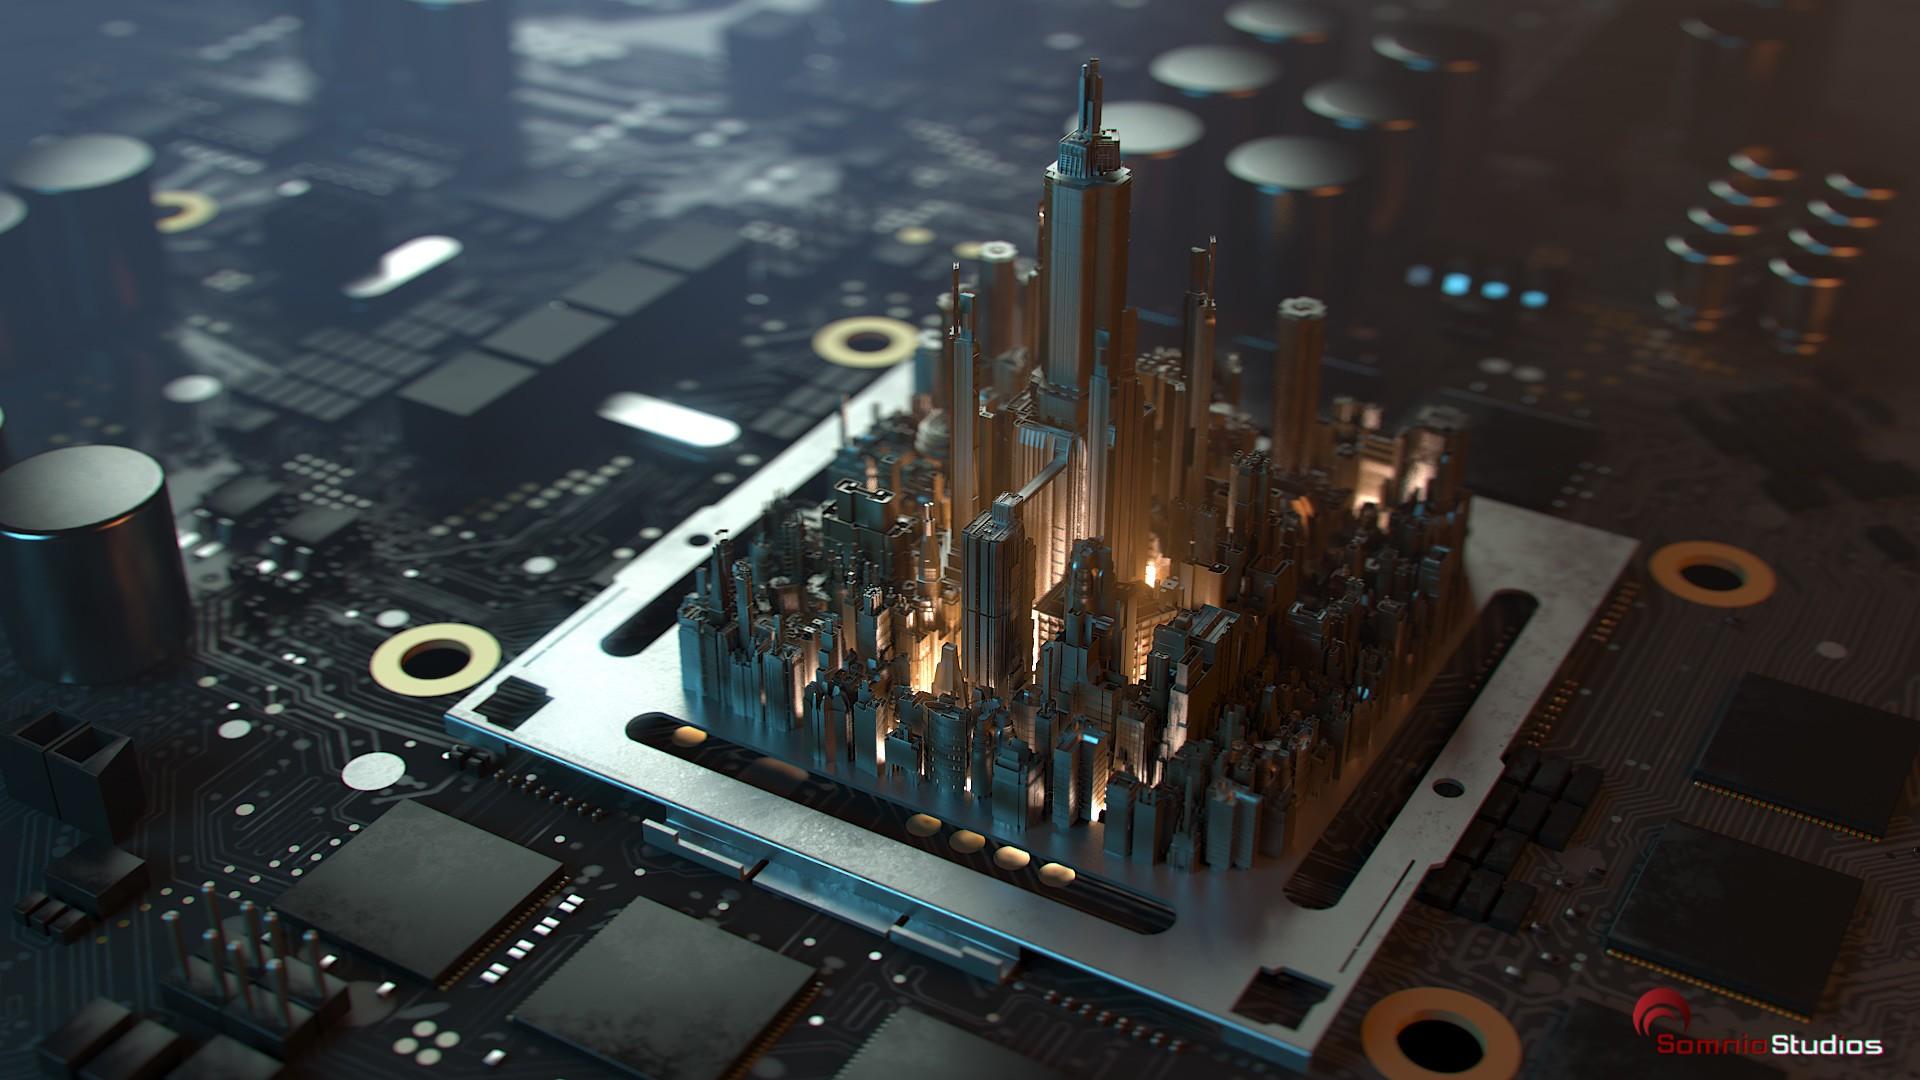 General 1920x1080 circuits city CPU skyscraper microchip depth of field processor 3D digital art PCB